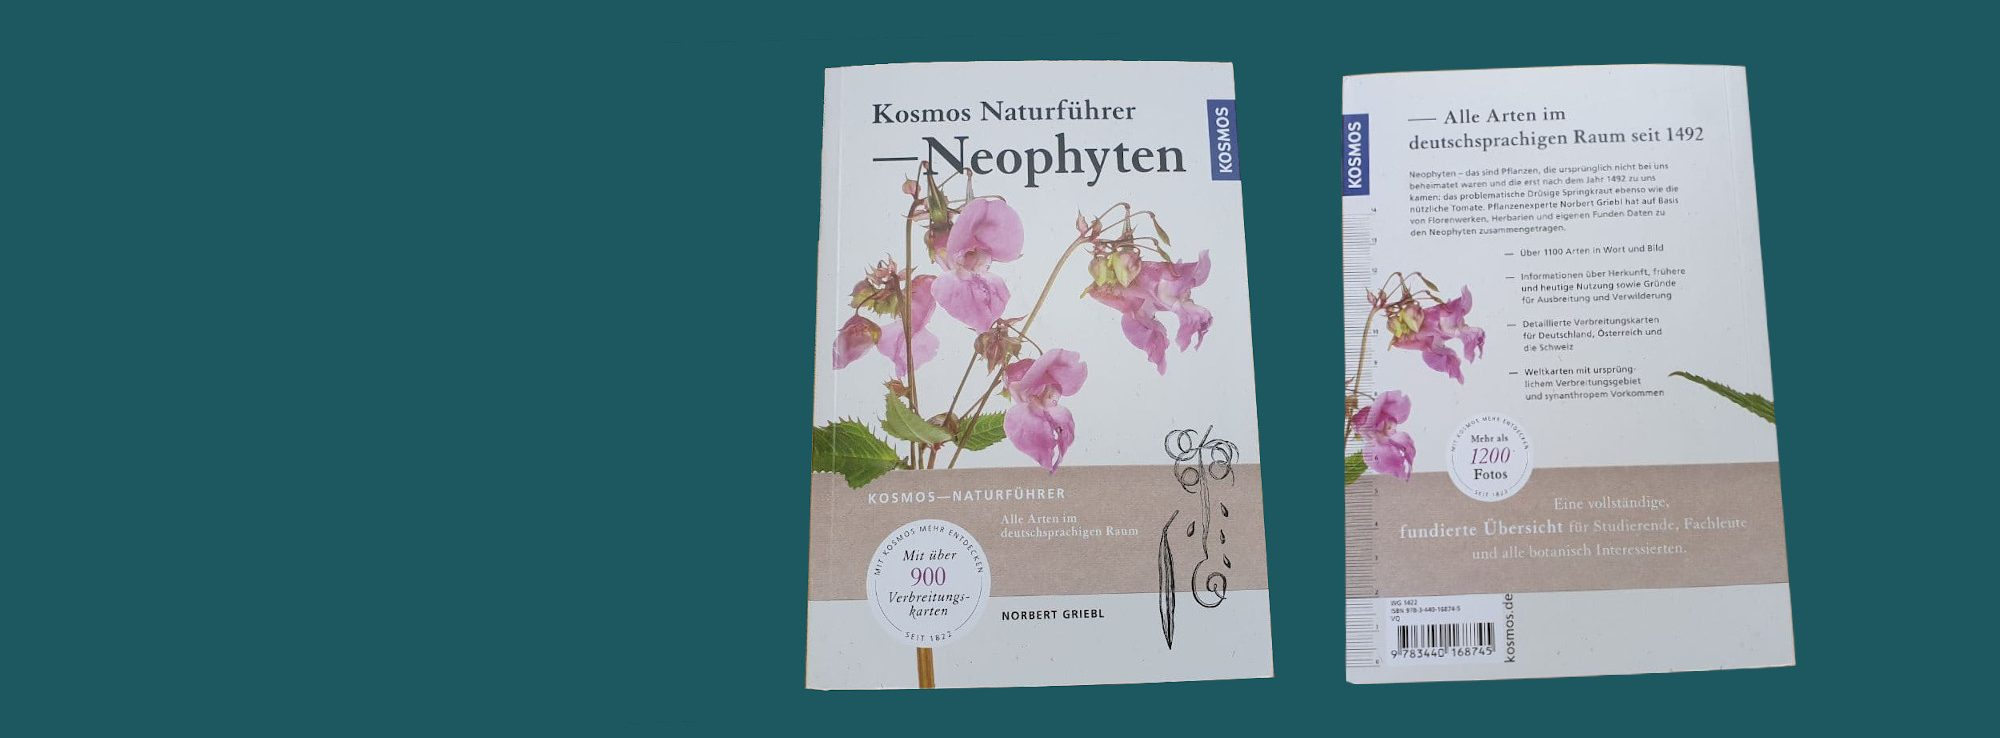 Kosmos Naturführer – Neophyten